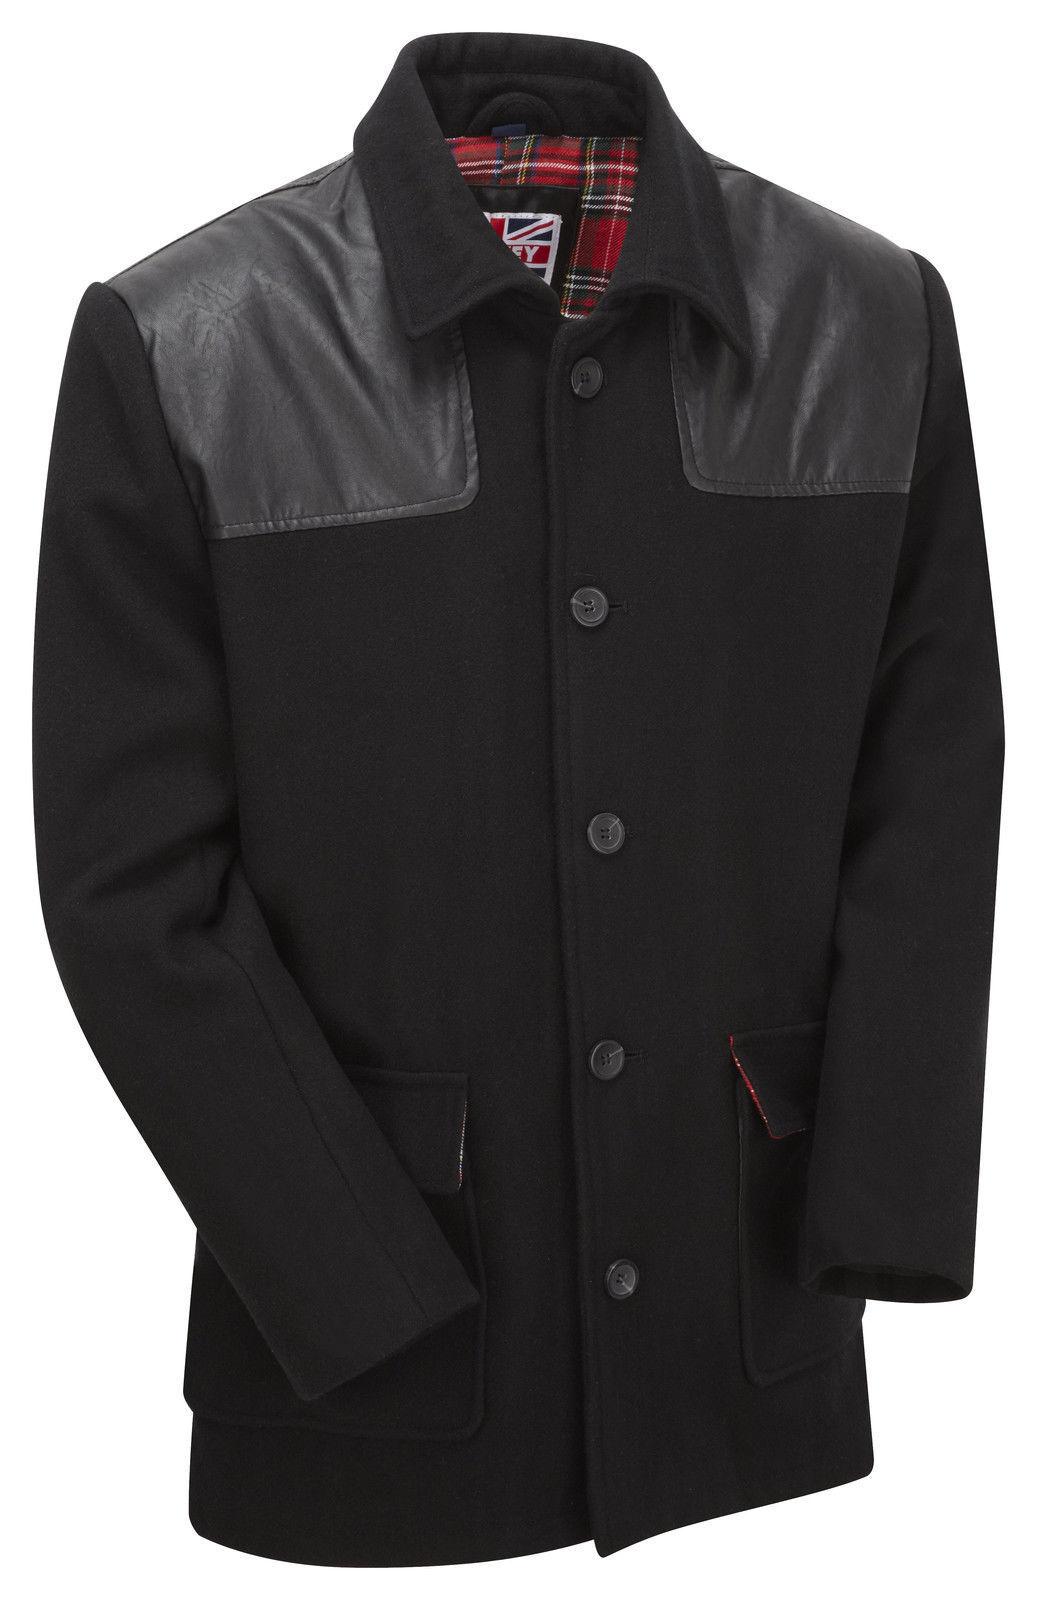 COATS & JACKETS - Overcoats Merci New Styles Sale Online 5yu6rVY7Q